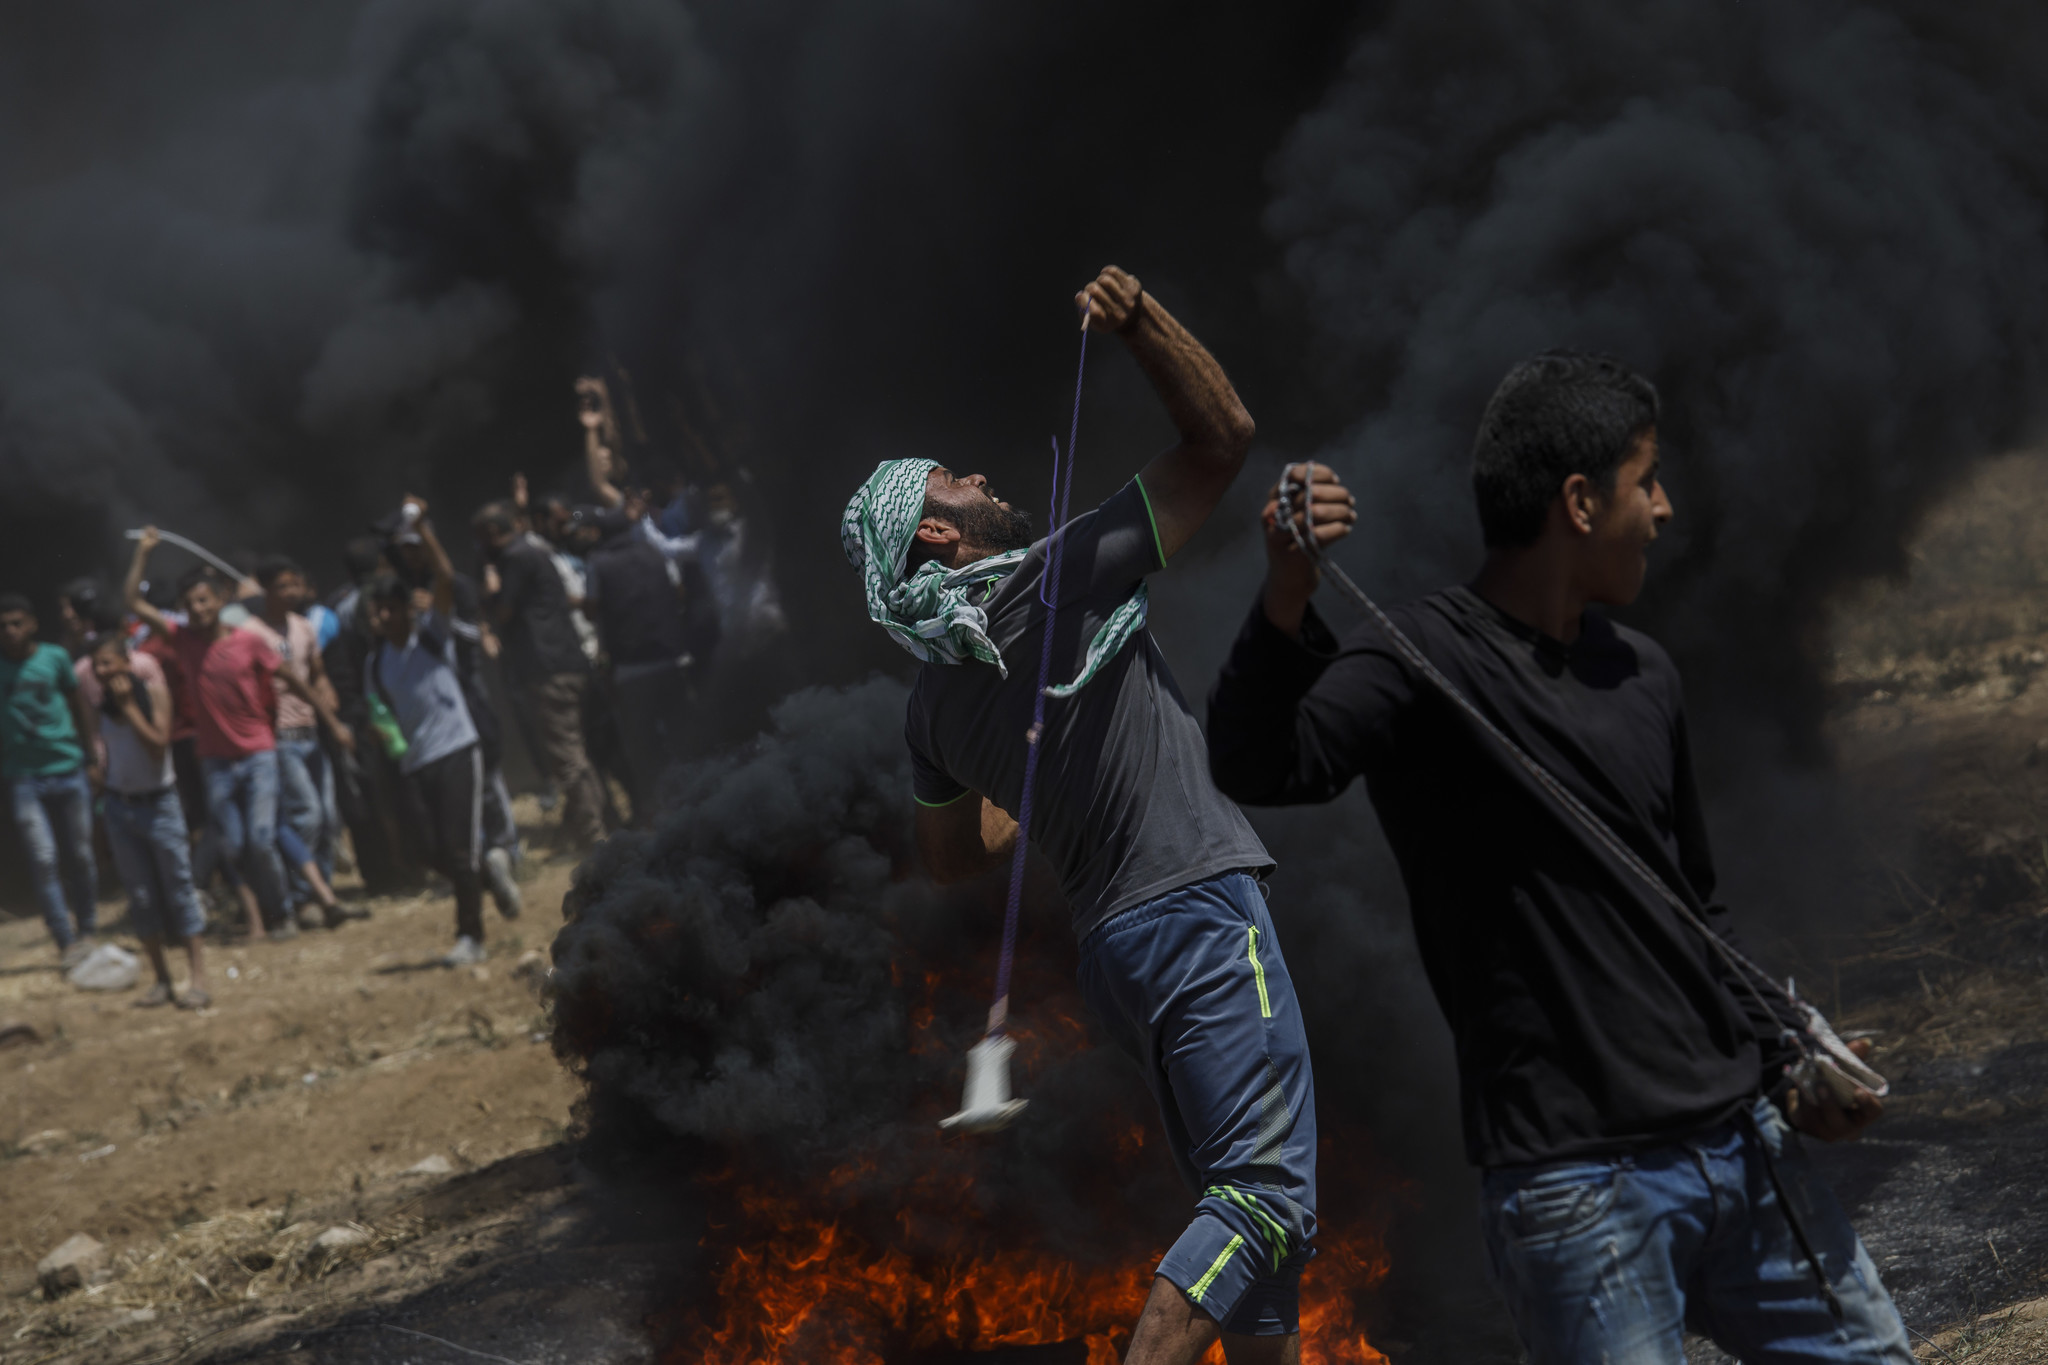 GAZA CITY, GAZA — MONDAY, MAY 14, 2018: Protesters fling projectile at the border fence separating